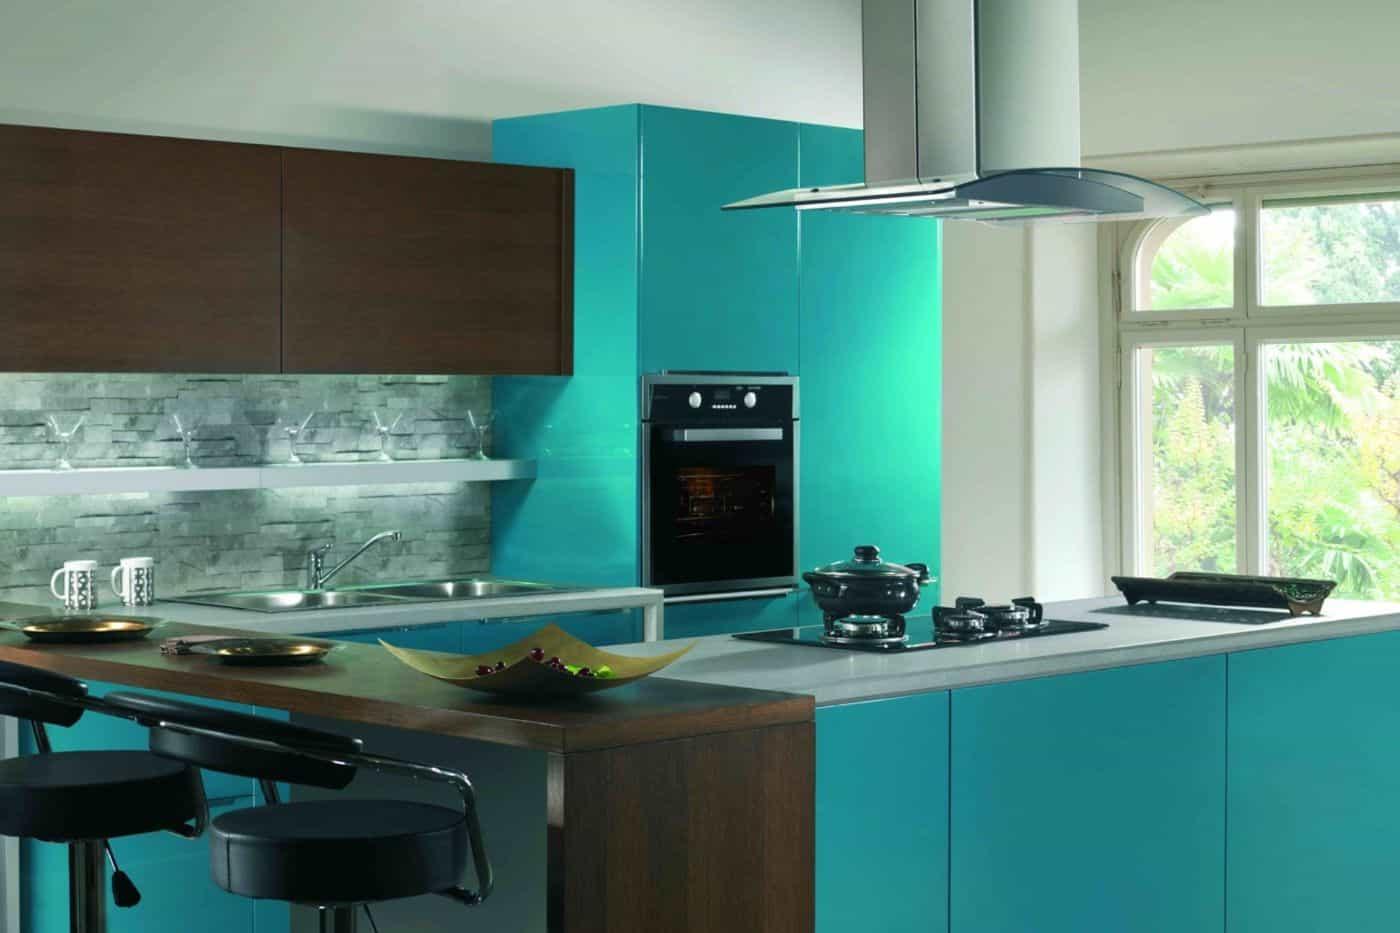 Green Kitchens That Will Make You Envious